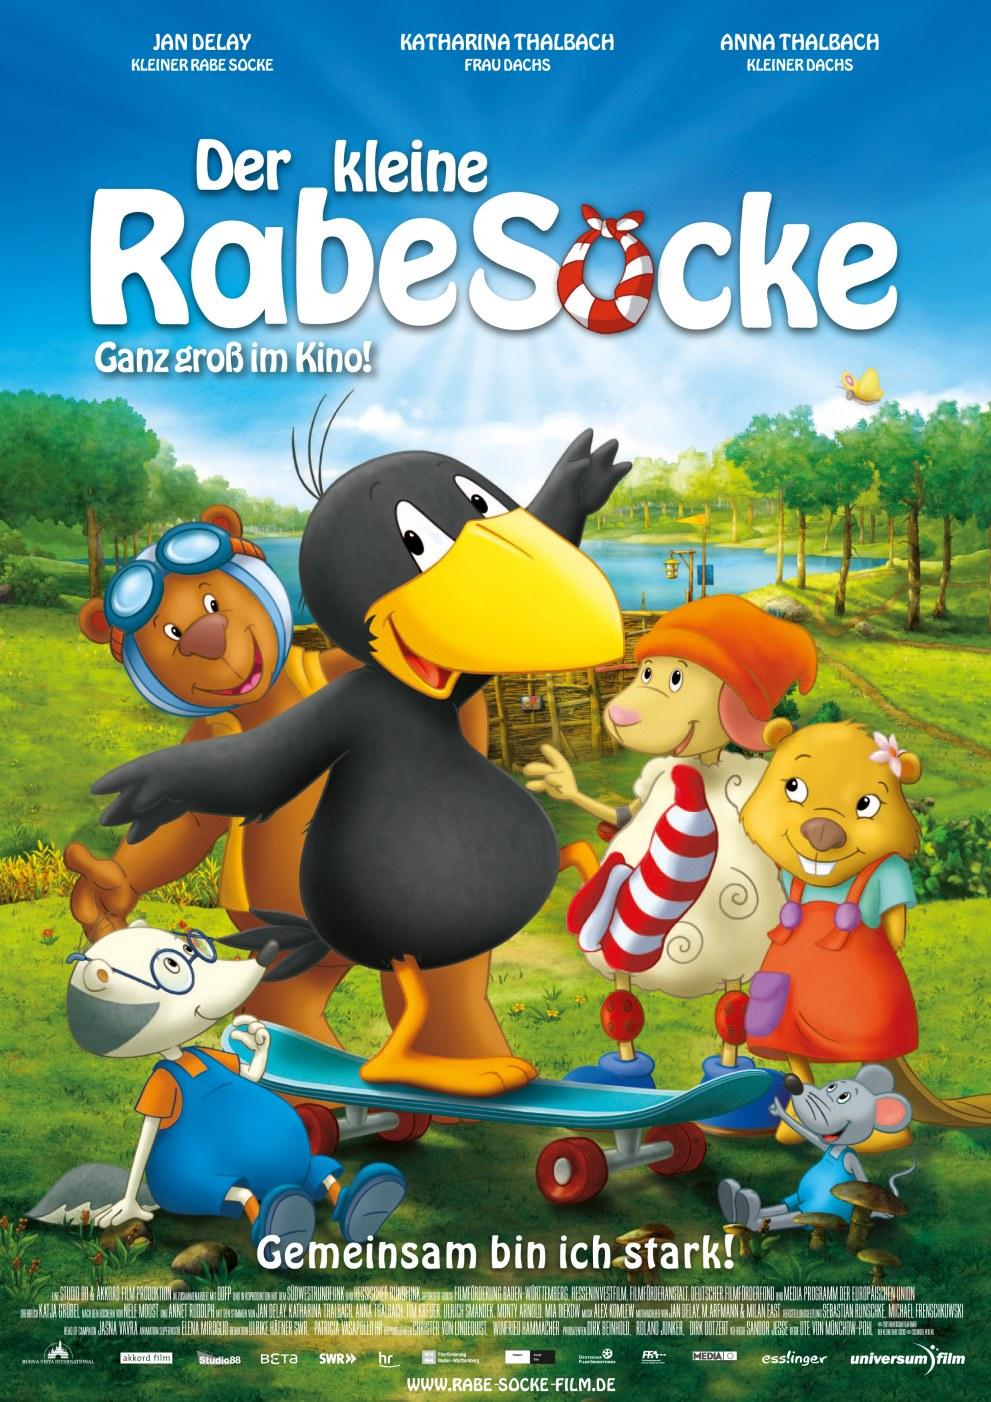 Rabe Socke Berlin